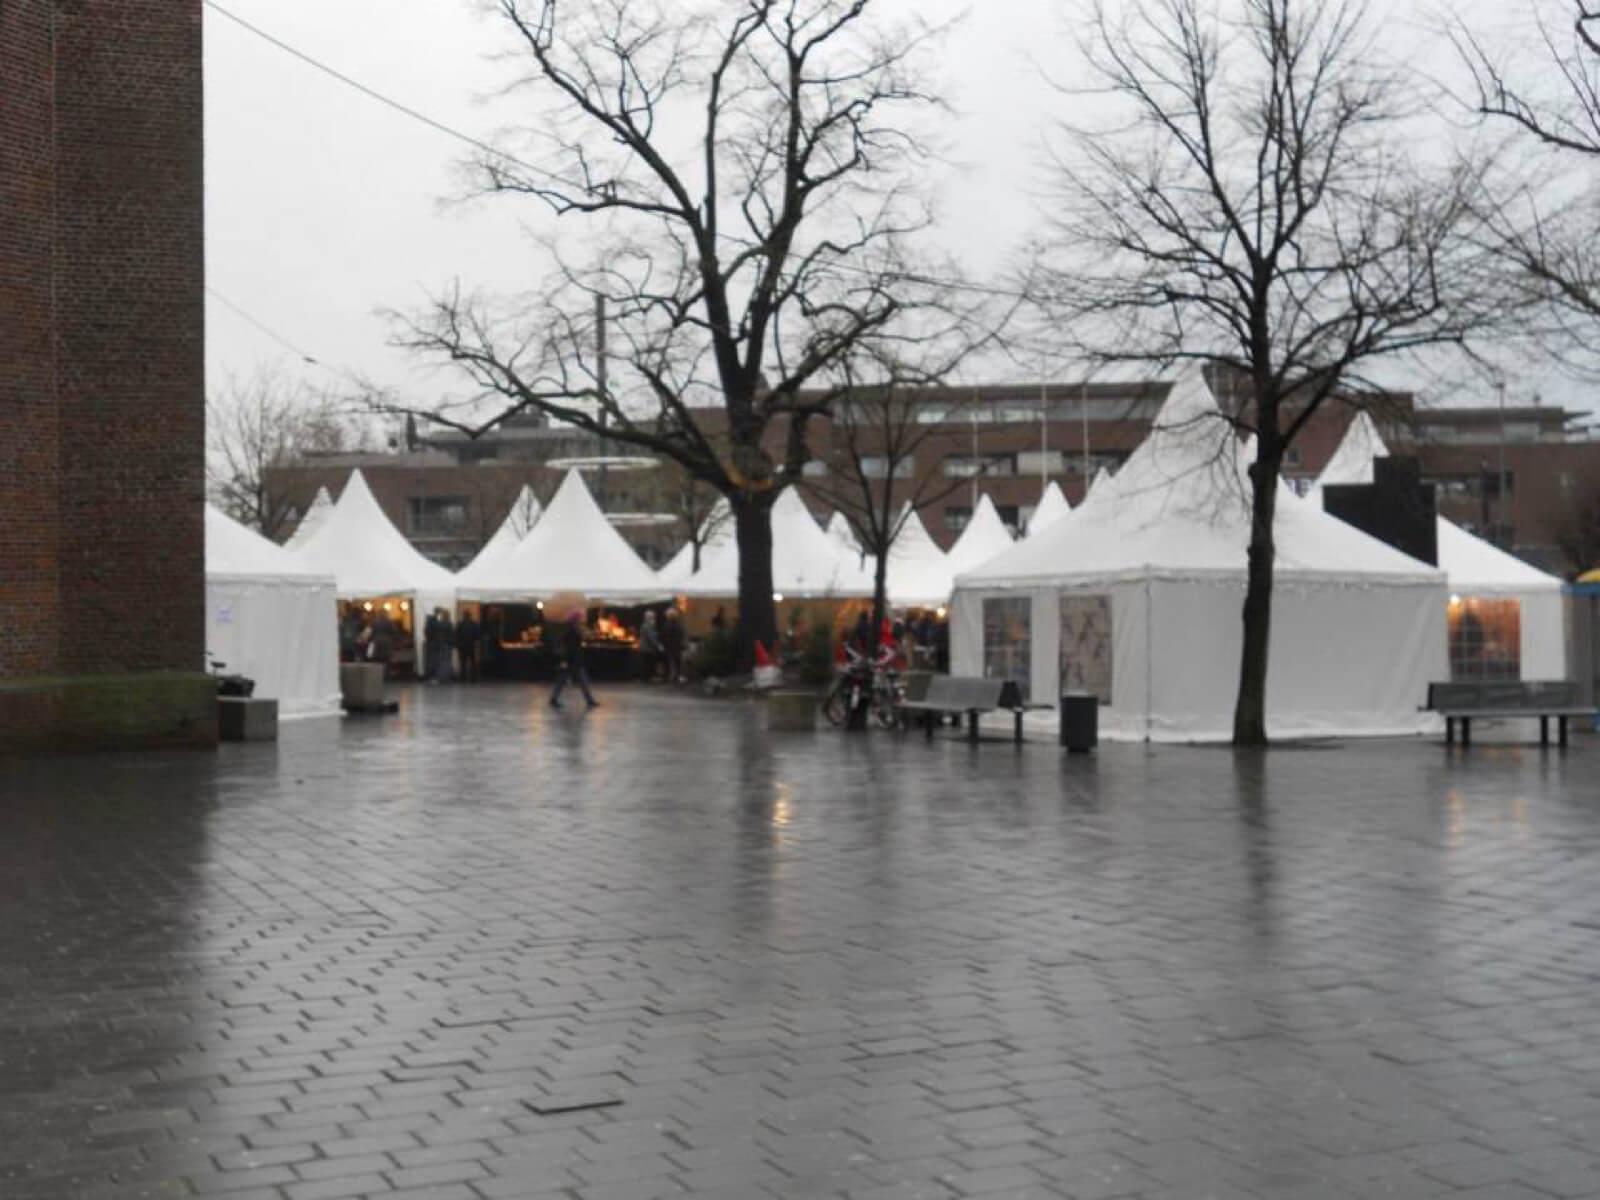 Pagode Tent 14